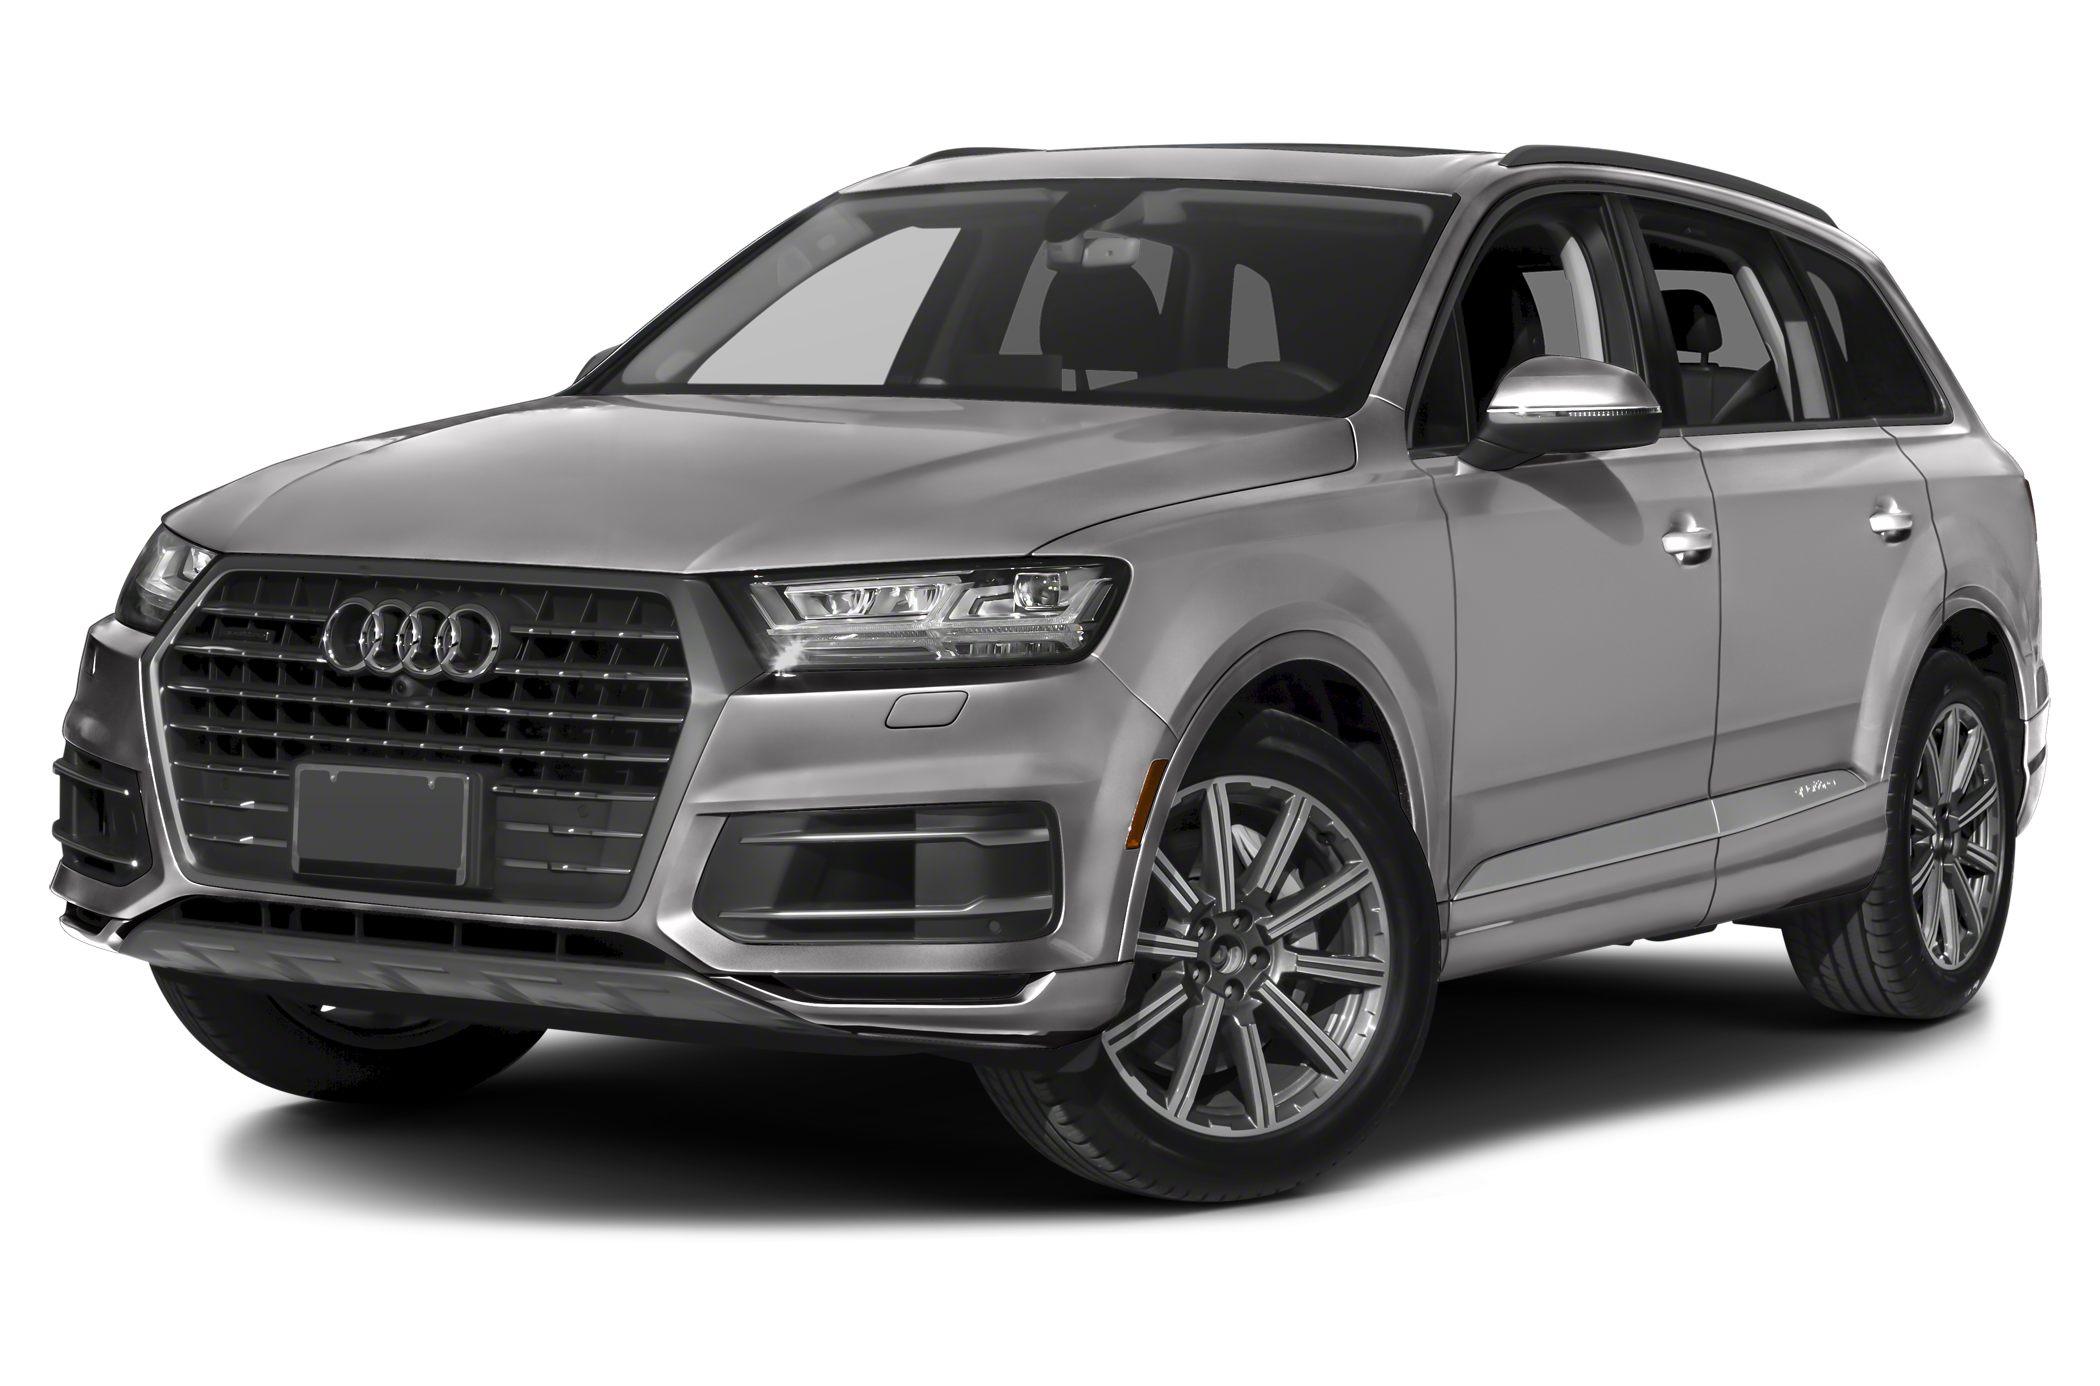 Audi Q7 Hd Background